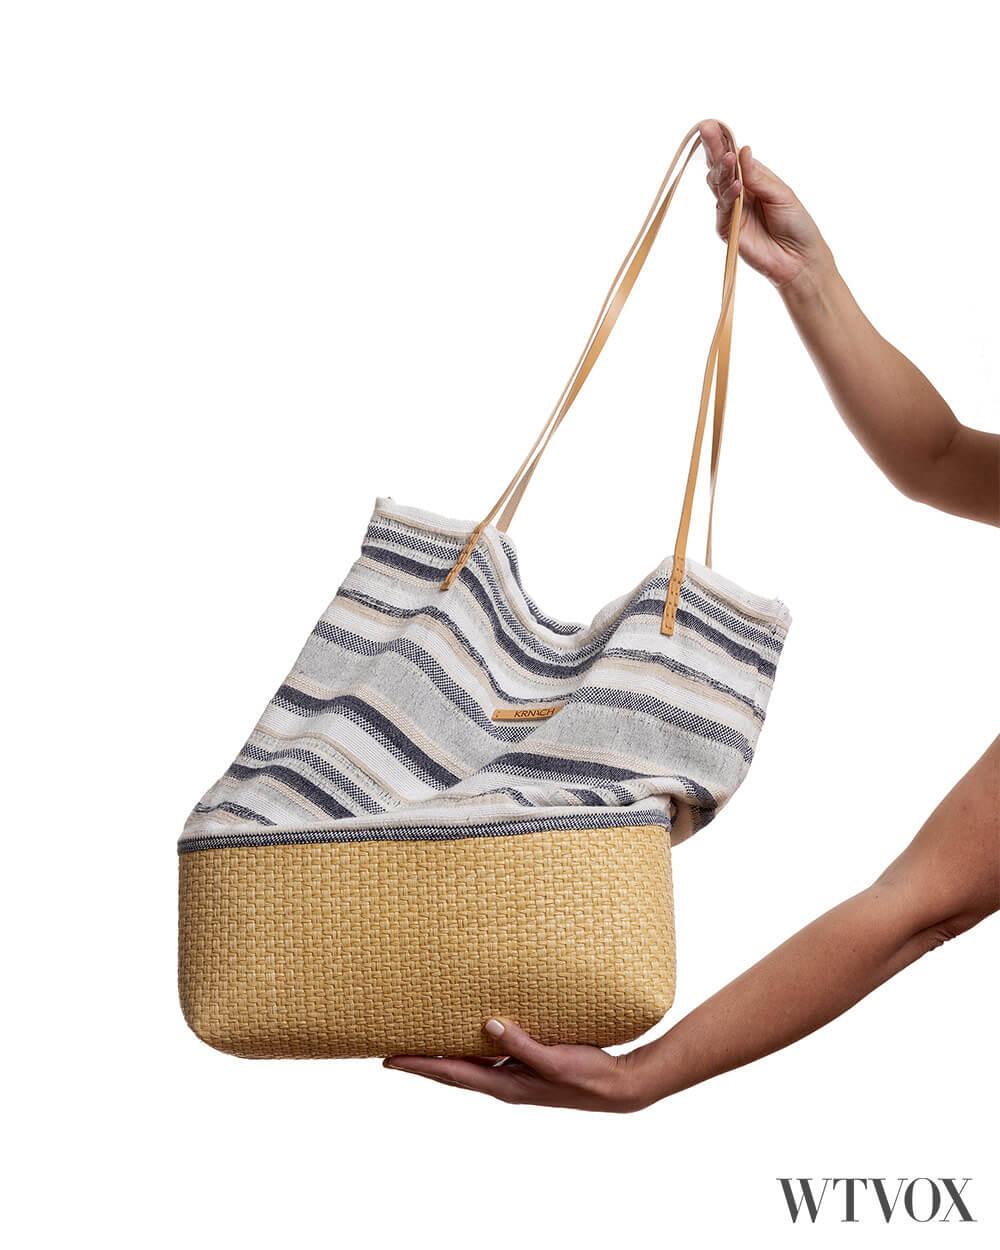 Krnach sustainable handbags